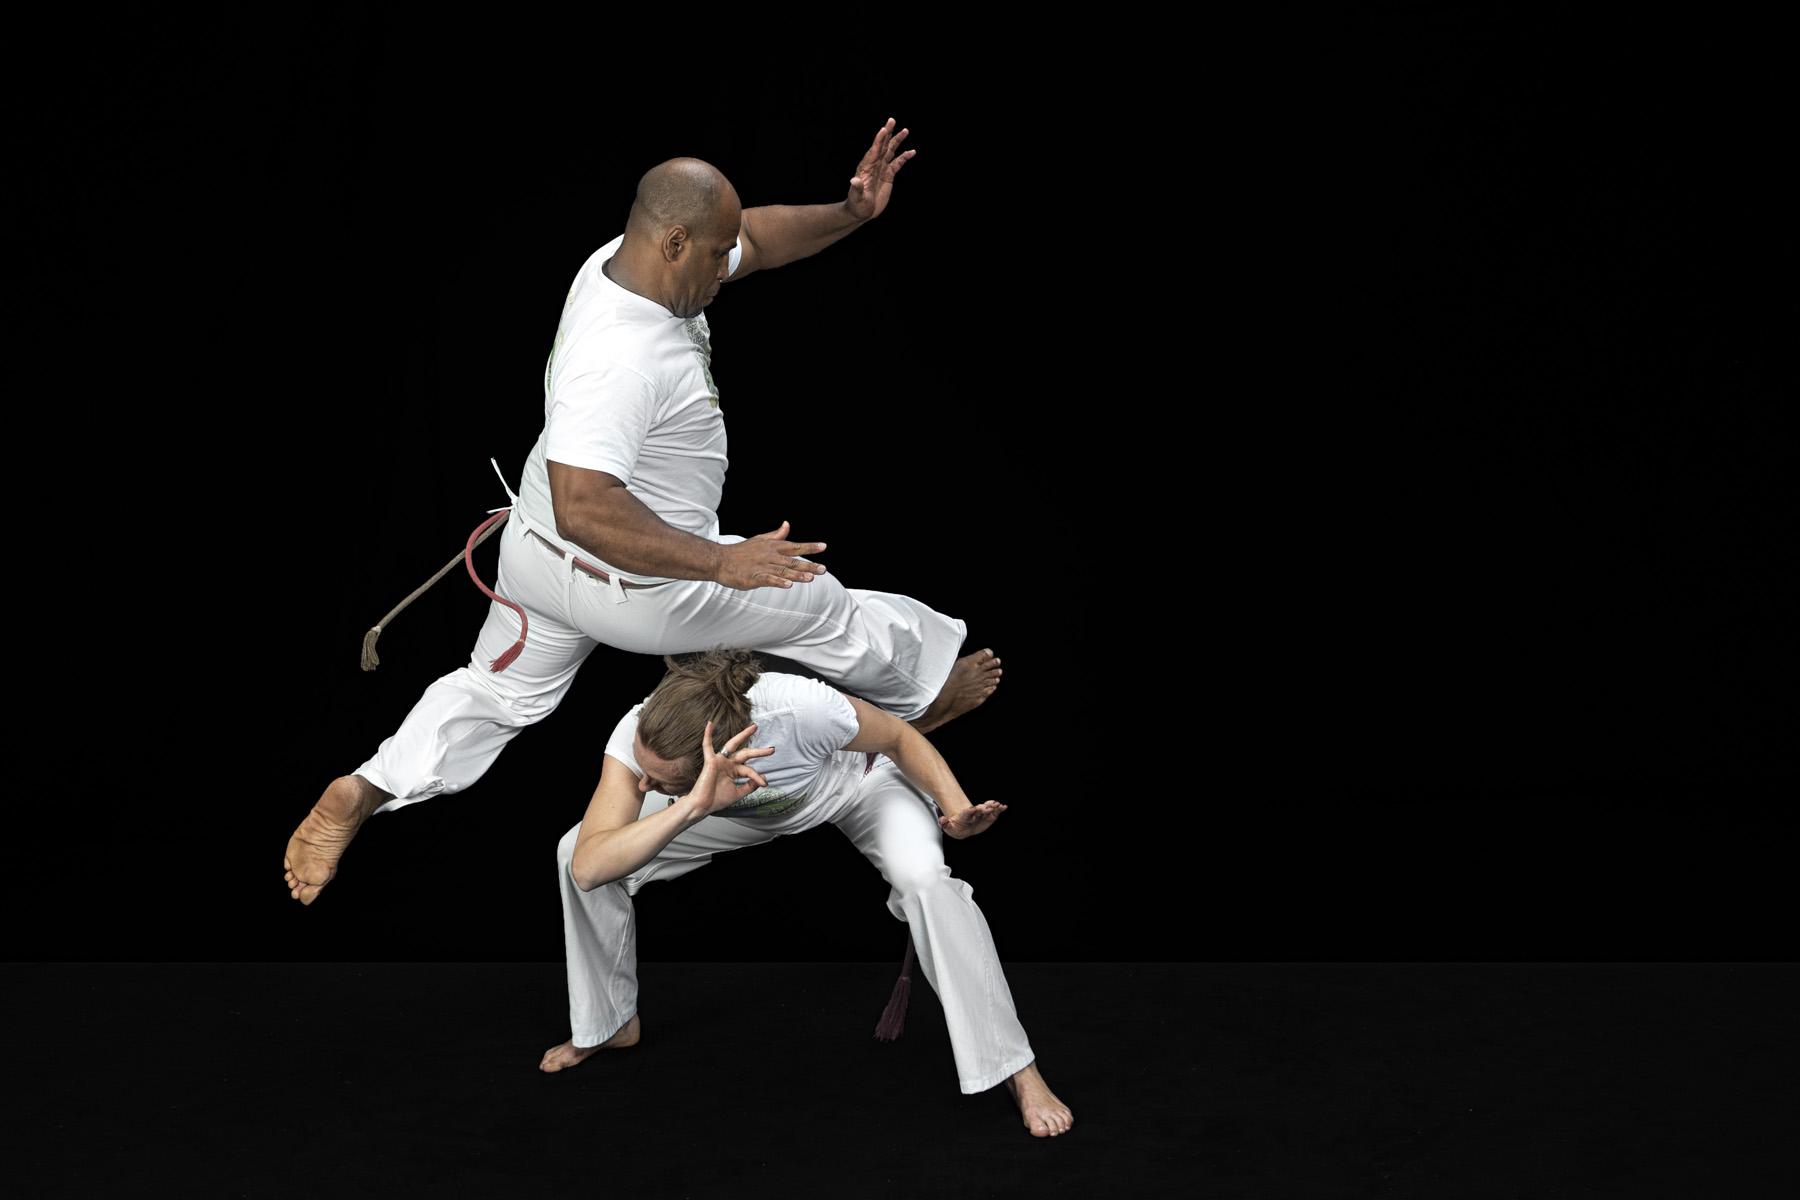 Bildnachweis: Christian Buck/Capoeira Heidelberg e.V.